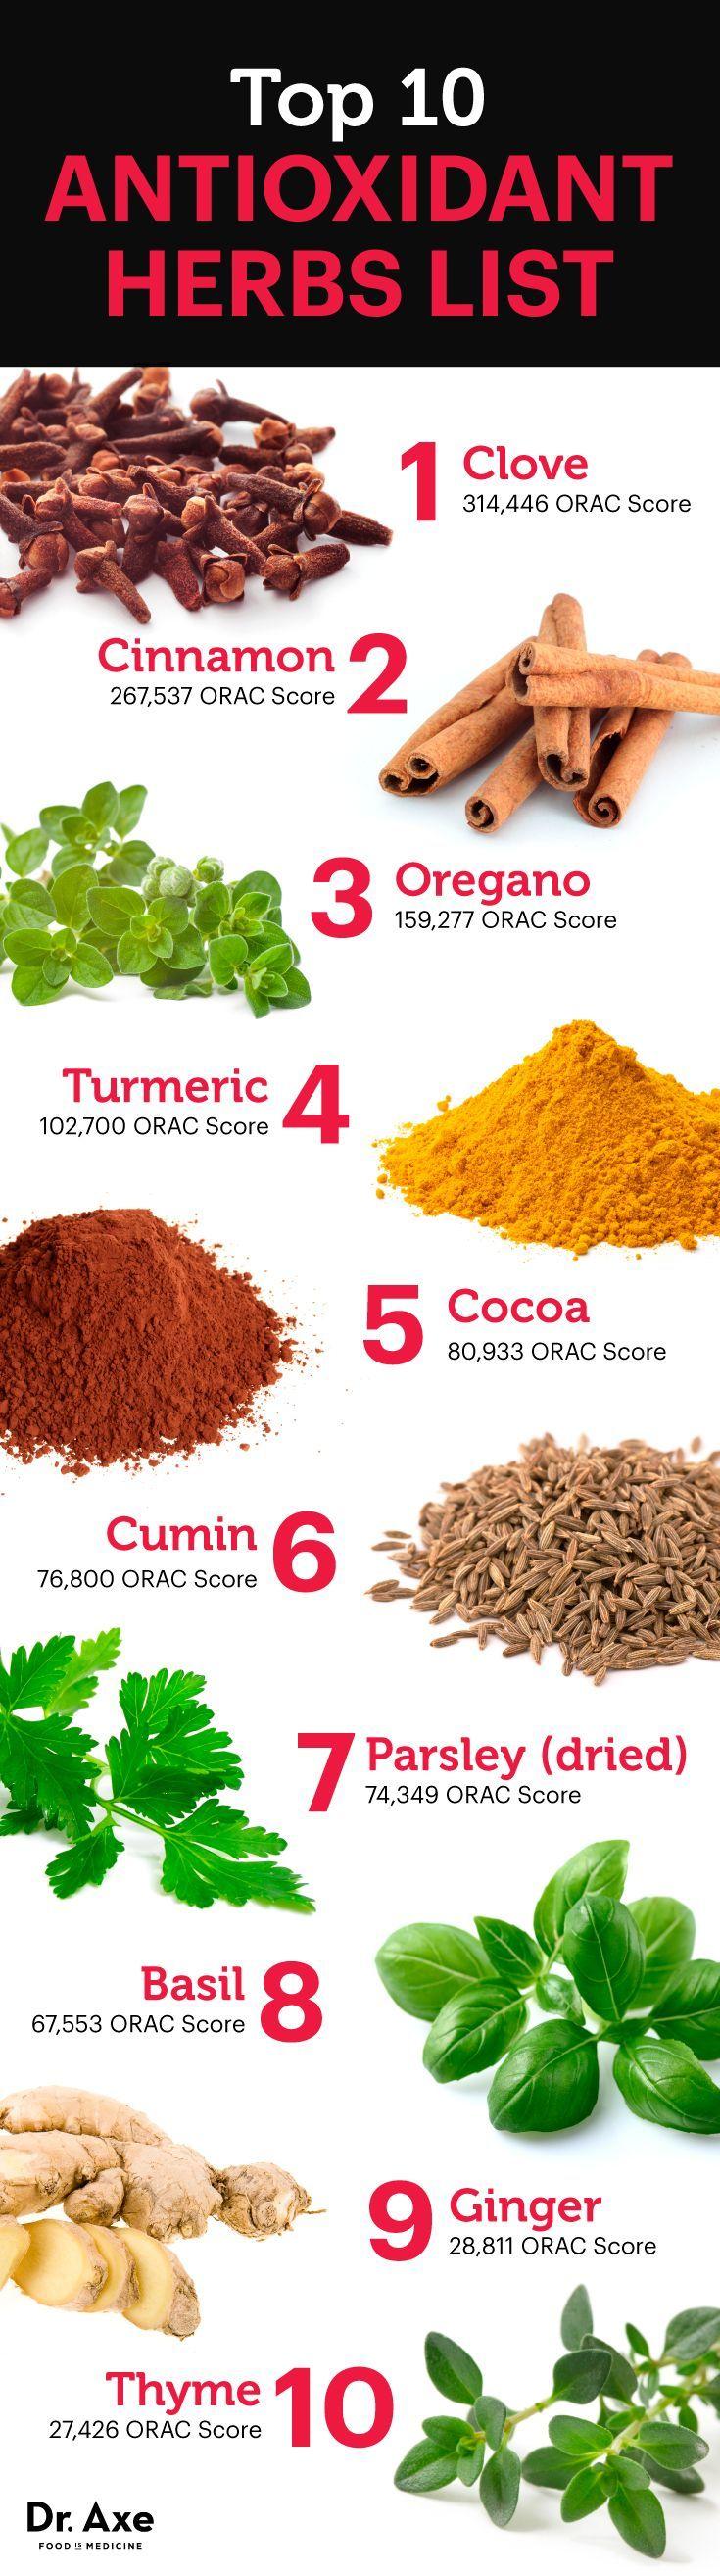 Top 10 High Antioxidant Foods - DrAxe.com #kombuchaguru #organic Also check out: kombuchaguru.com